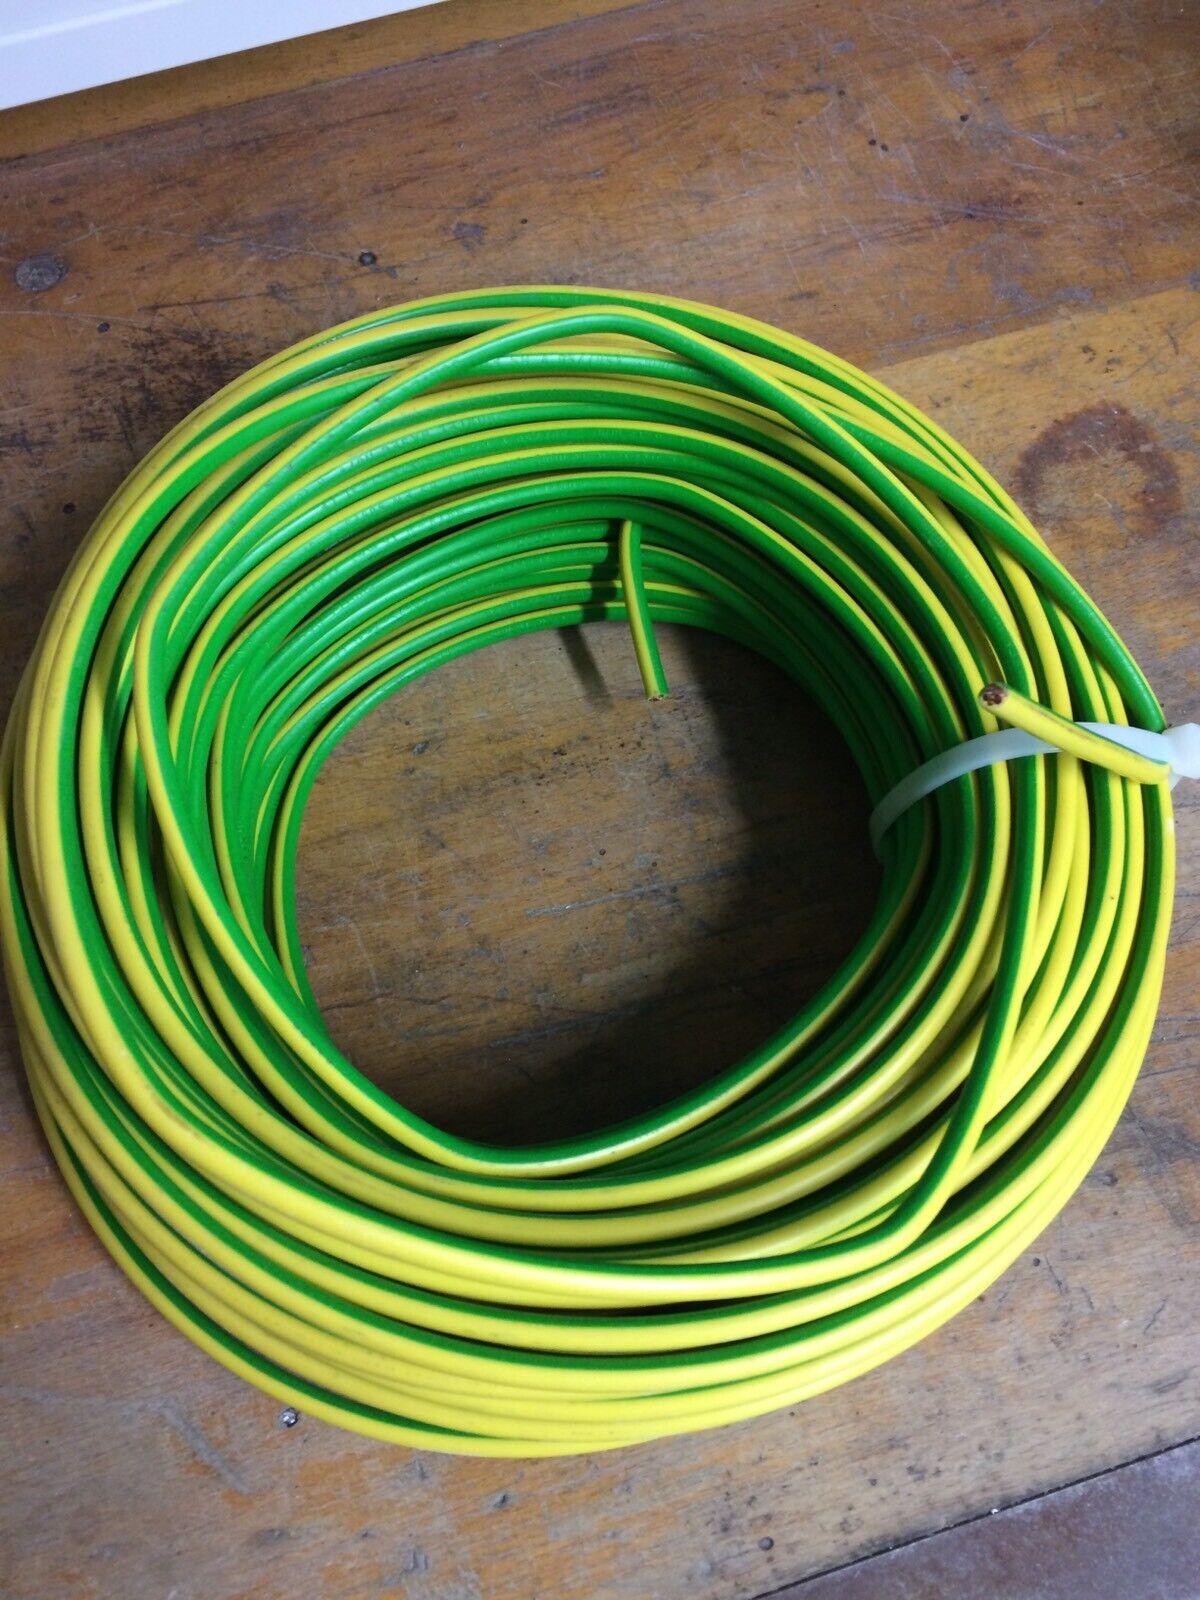 Erdungsdraht 60 M, 1x16qmm grün gelb,H07V-U, Mehrdraht Starr